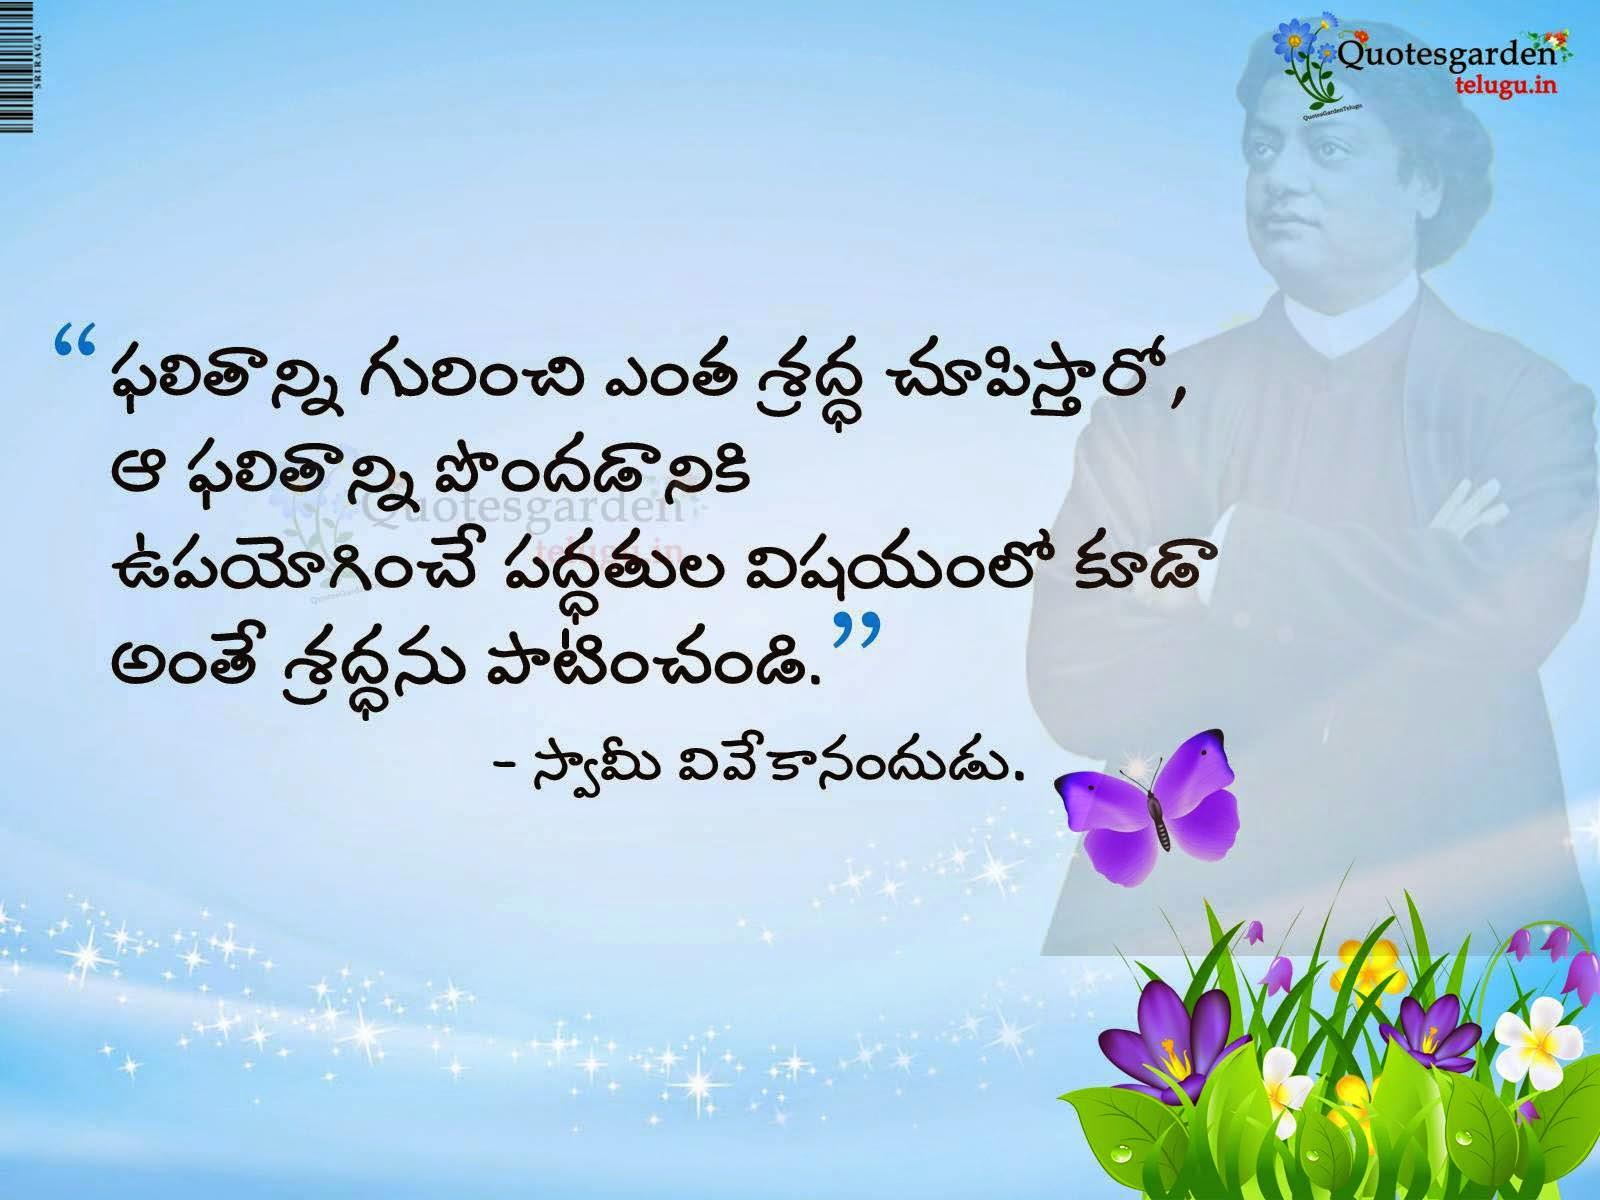 Swami Vivekananda Quotes Wallpapers In Hindi Vivekananda Inspirational Quotes Best Telugu Quotes